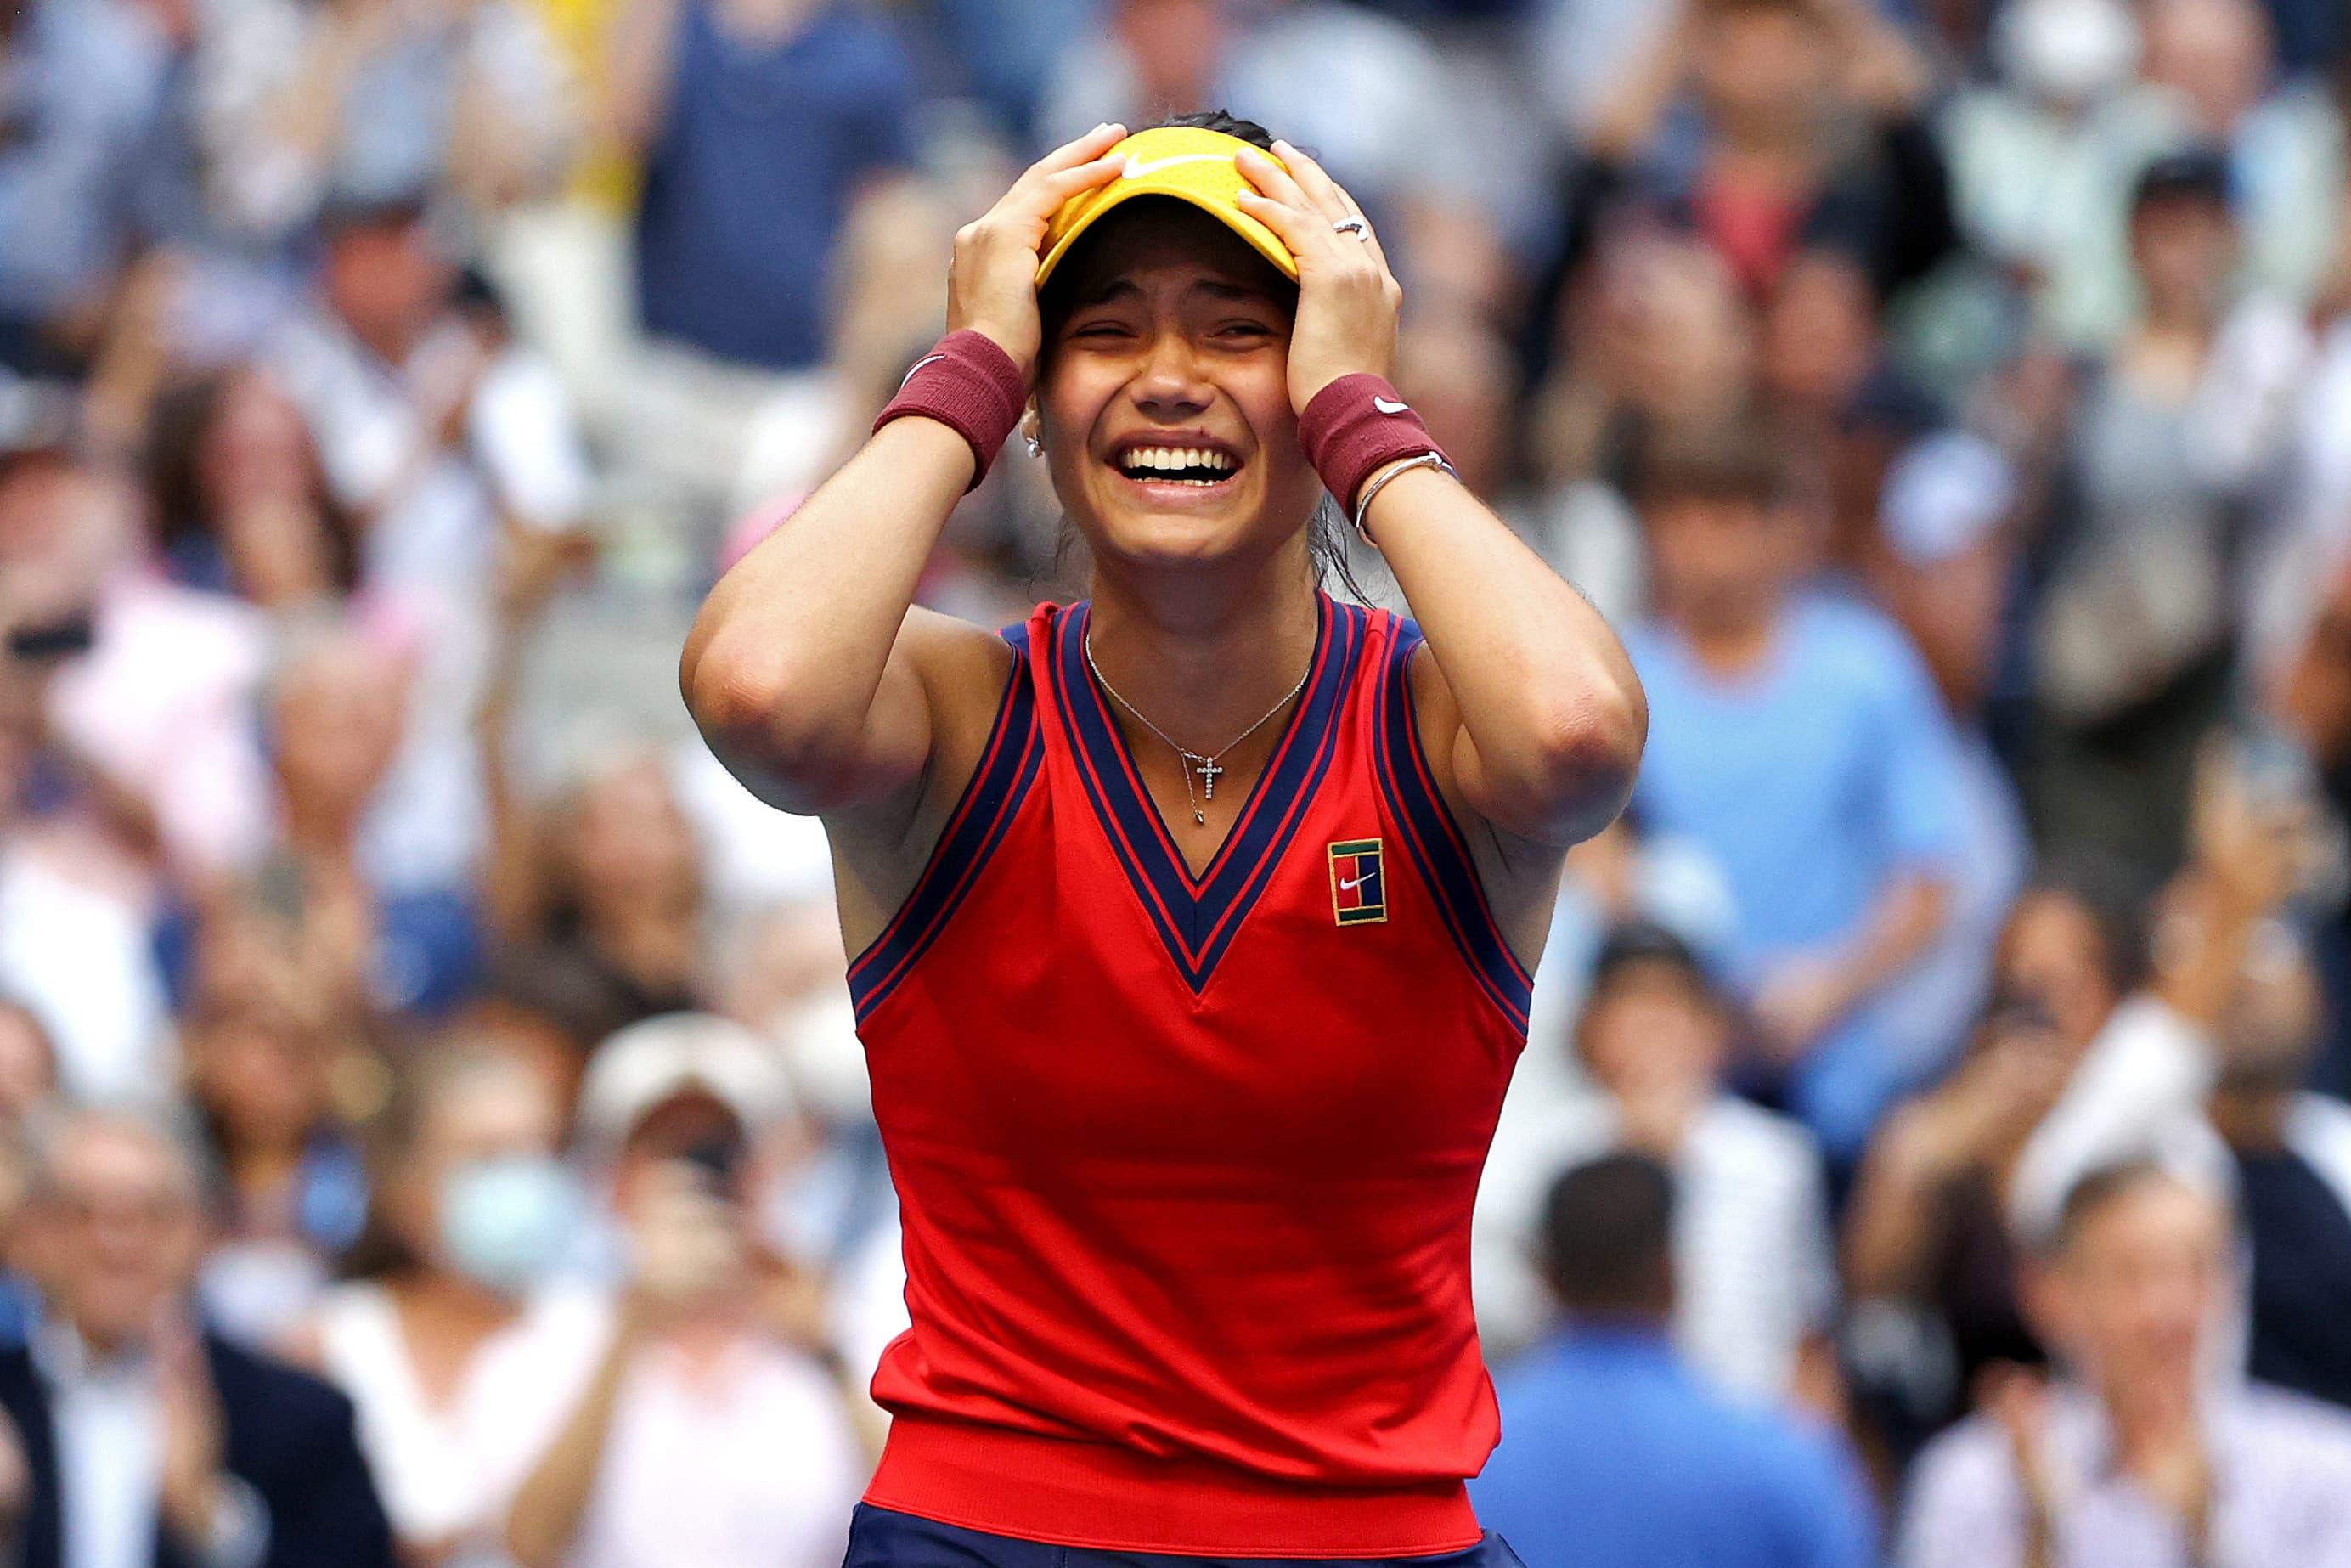 , British tennis player Emma Raducanu wins U.S. Open women's final, The World Live Breaking News Coverage & Updates IN ENGLISH